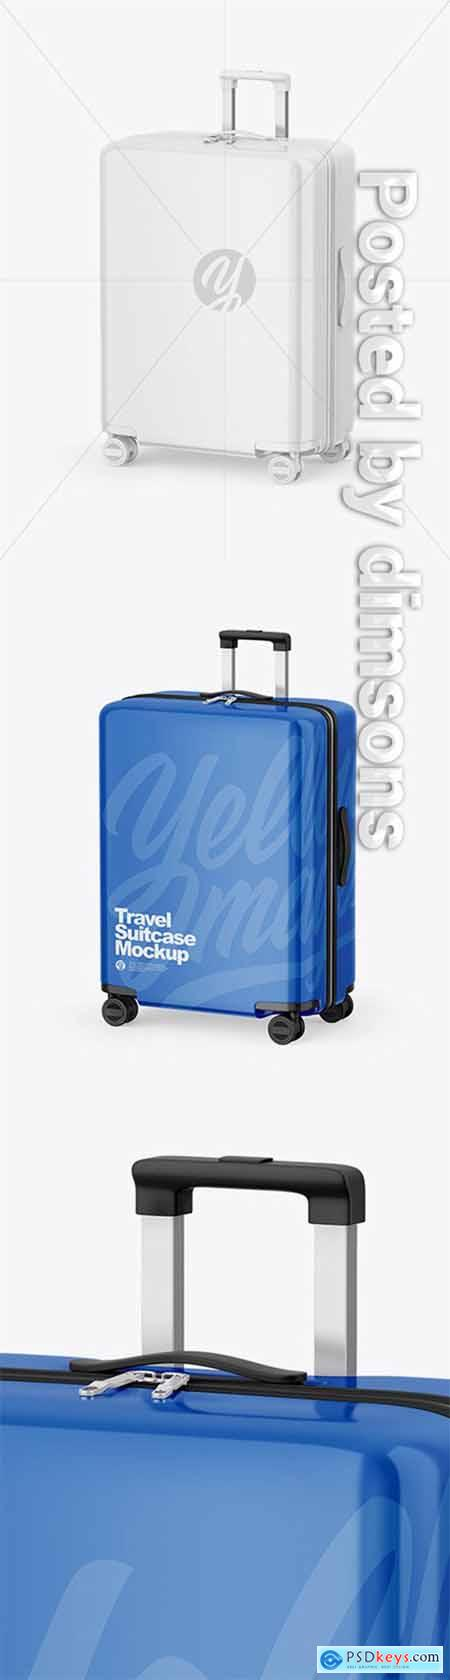 Glossy Travel Suitcase Mockup 65014